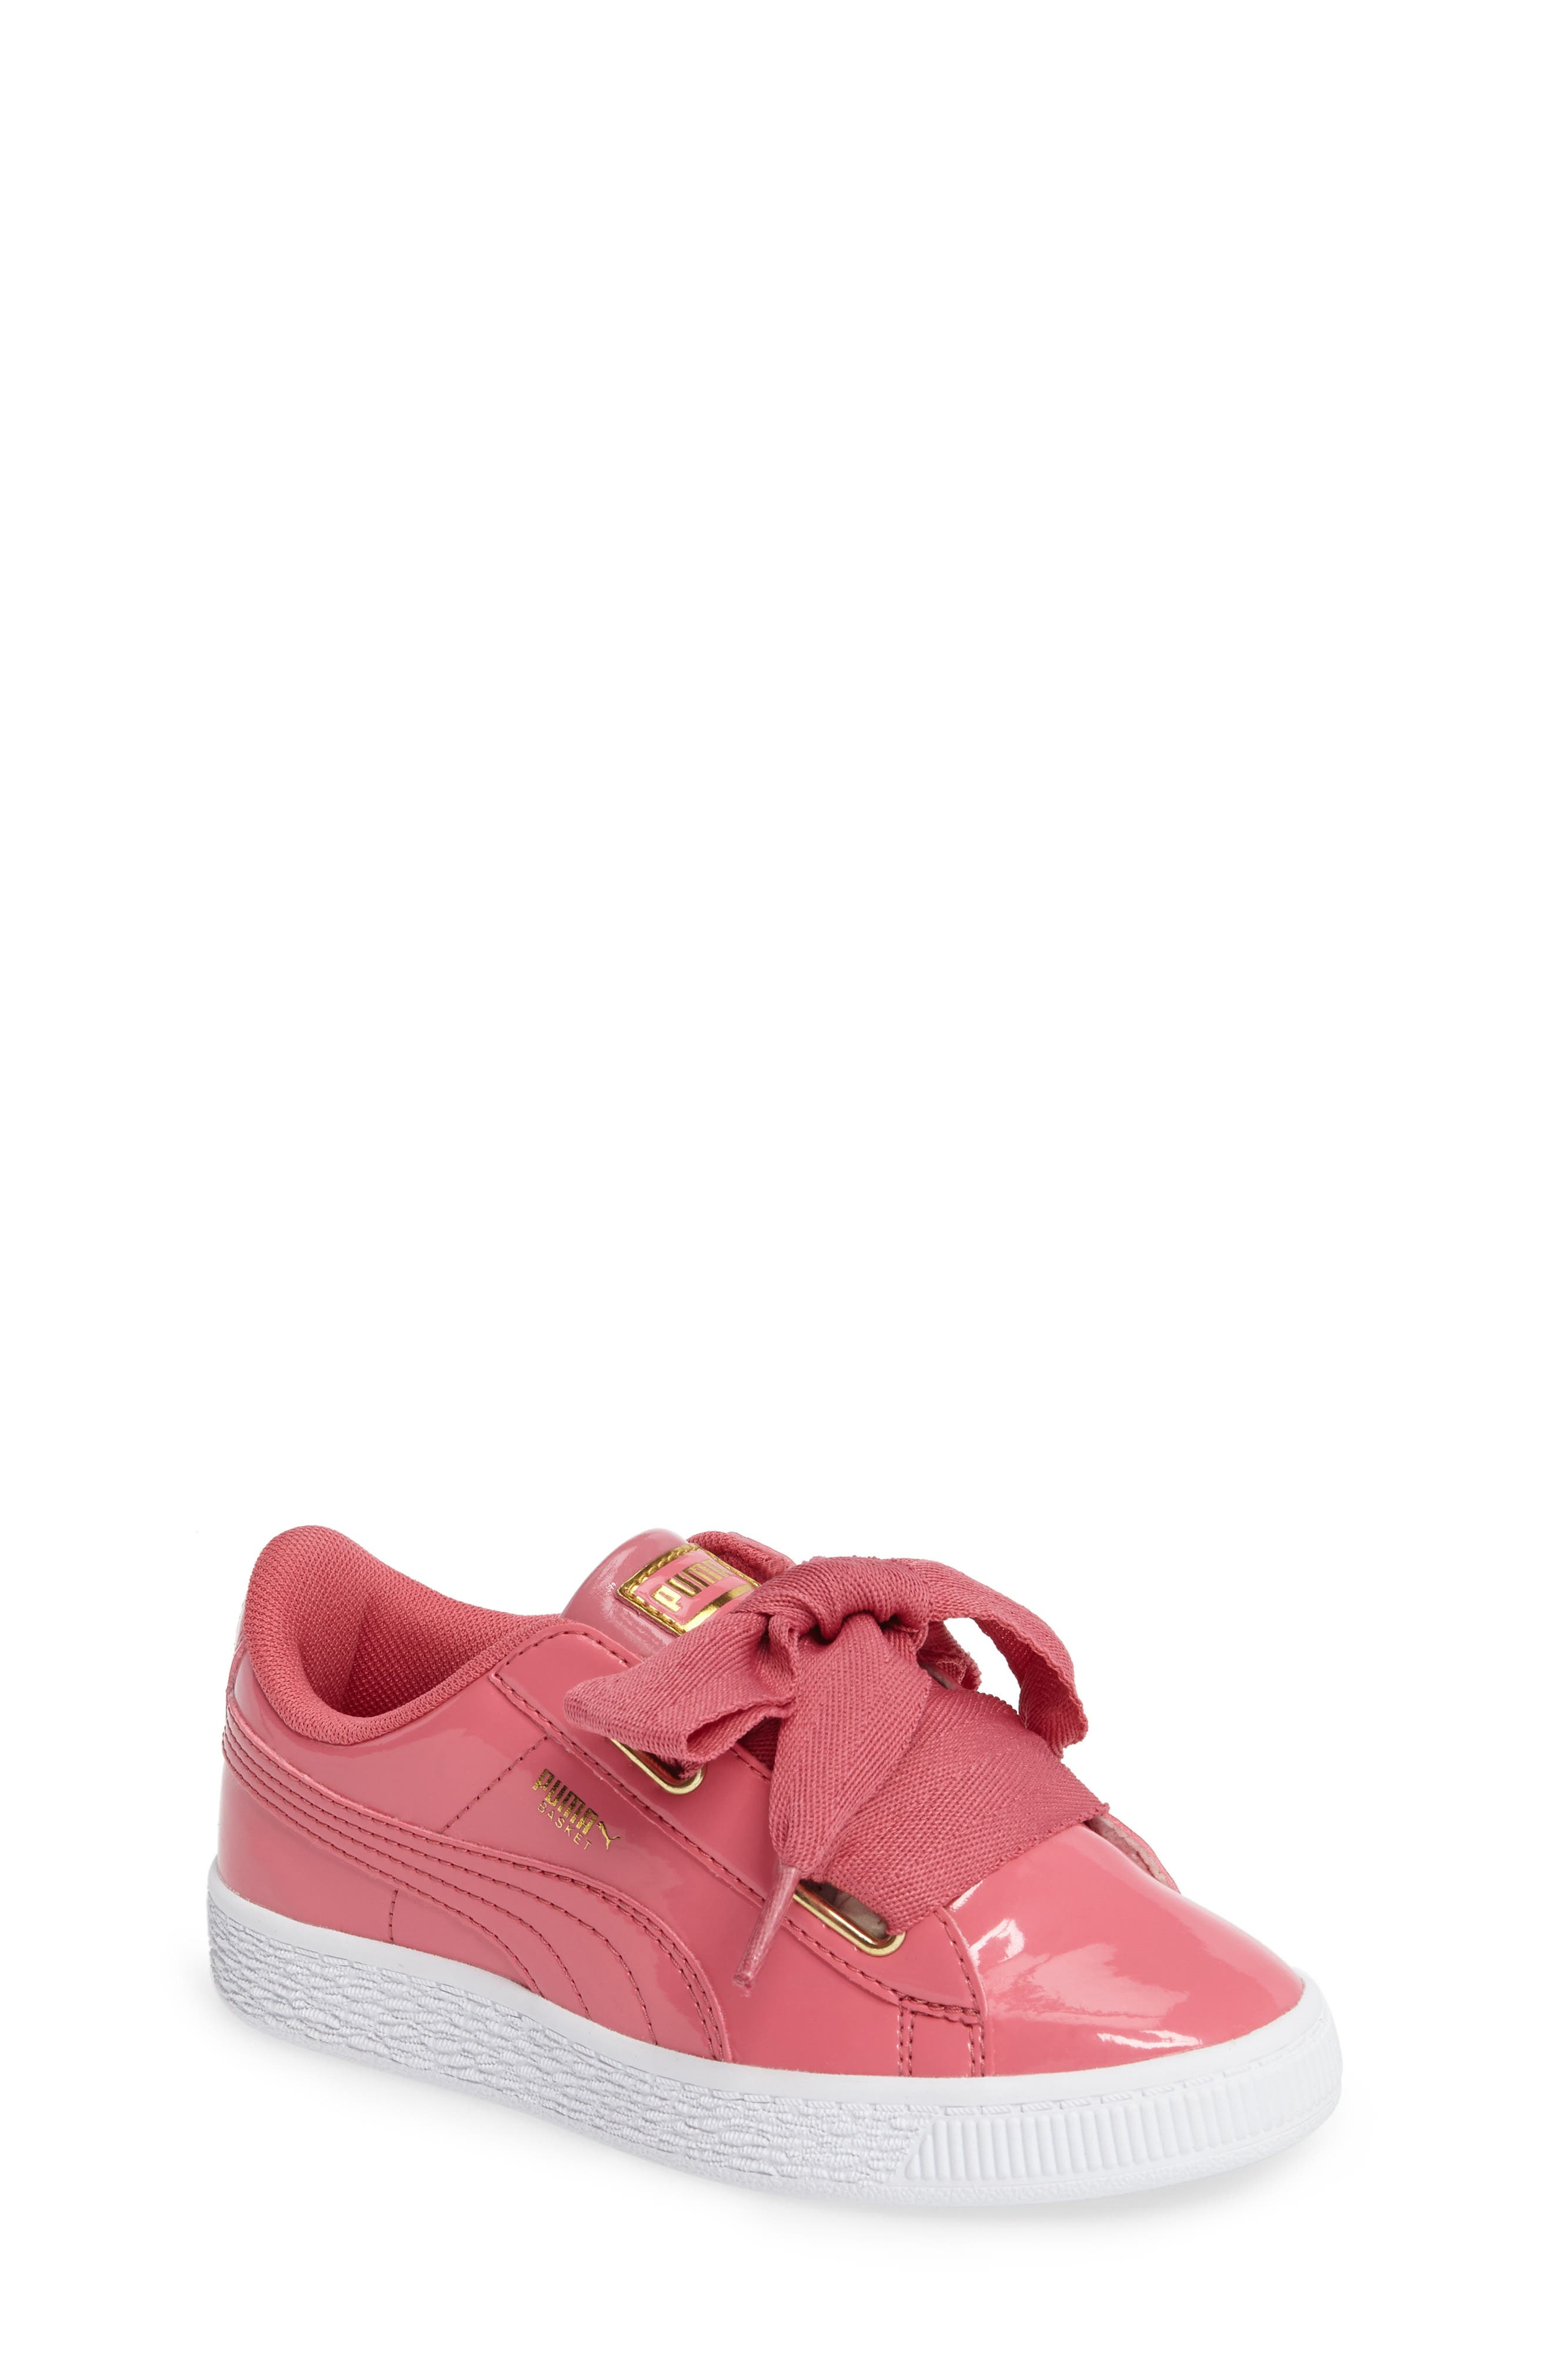 Basket Heart Sneaker,                             Main thumbnail 1, color,                             Rapture Rose/ Puma Team Gold